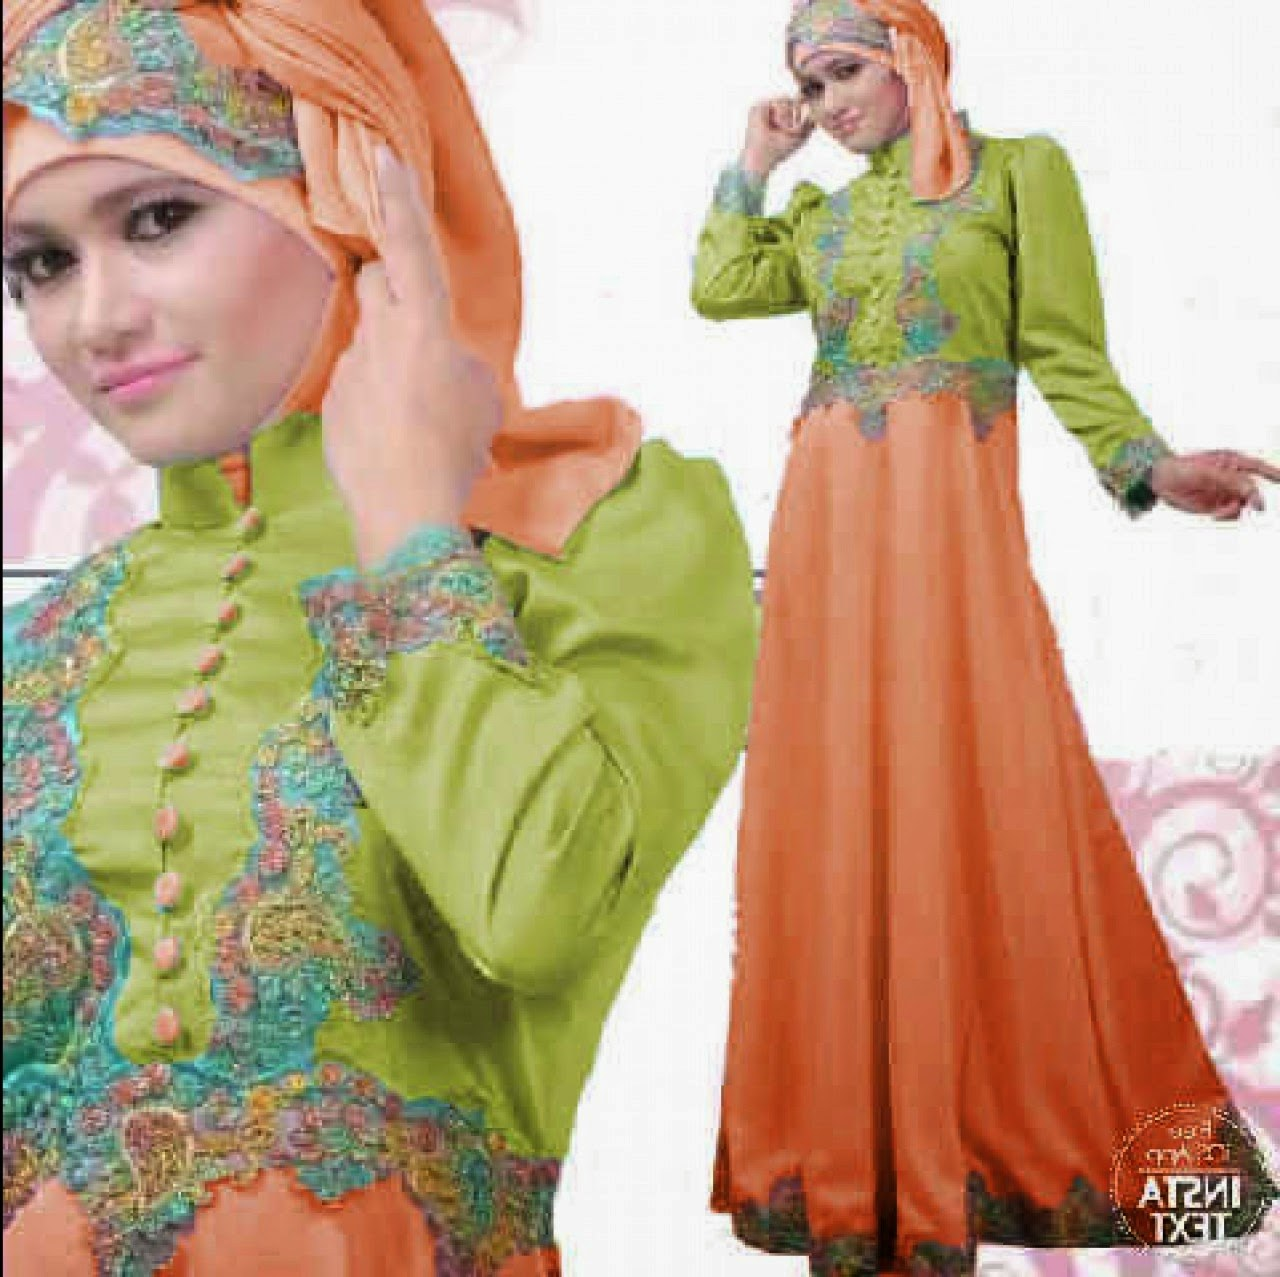 Bentuk Model Jahitan Baju Lebaran 9ddf Kumpulan Foto Model Baju Kebaya Lebaran Terbaru 2018